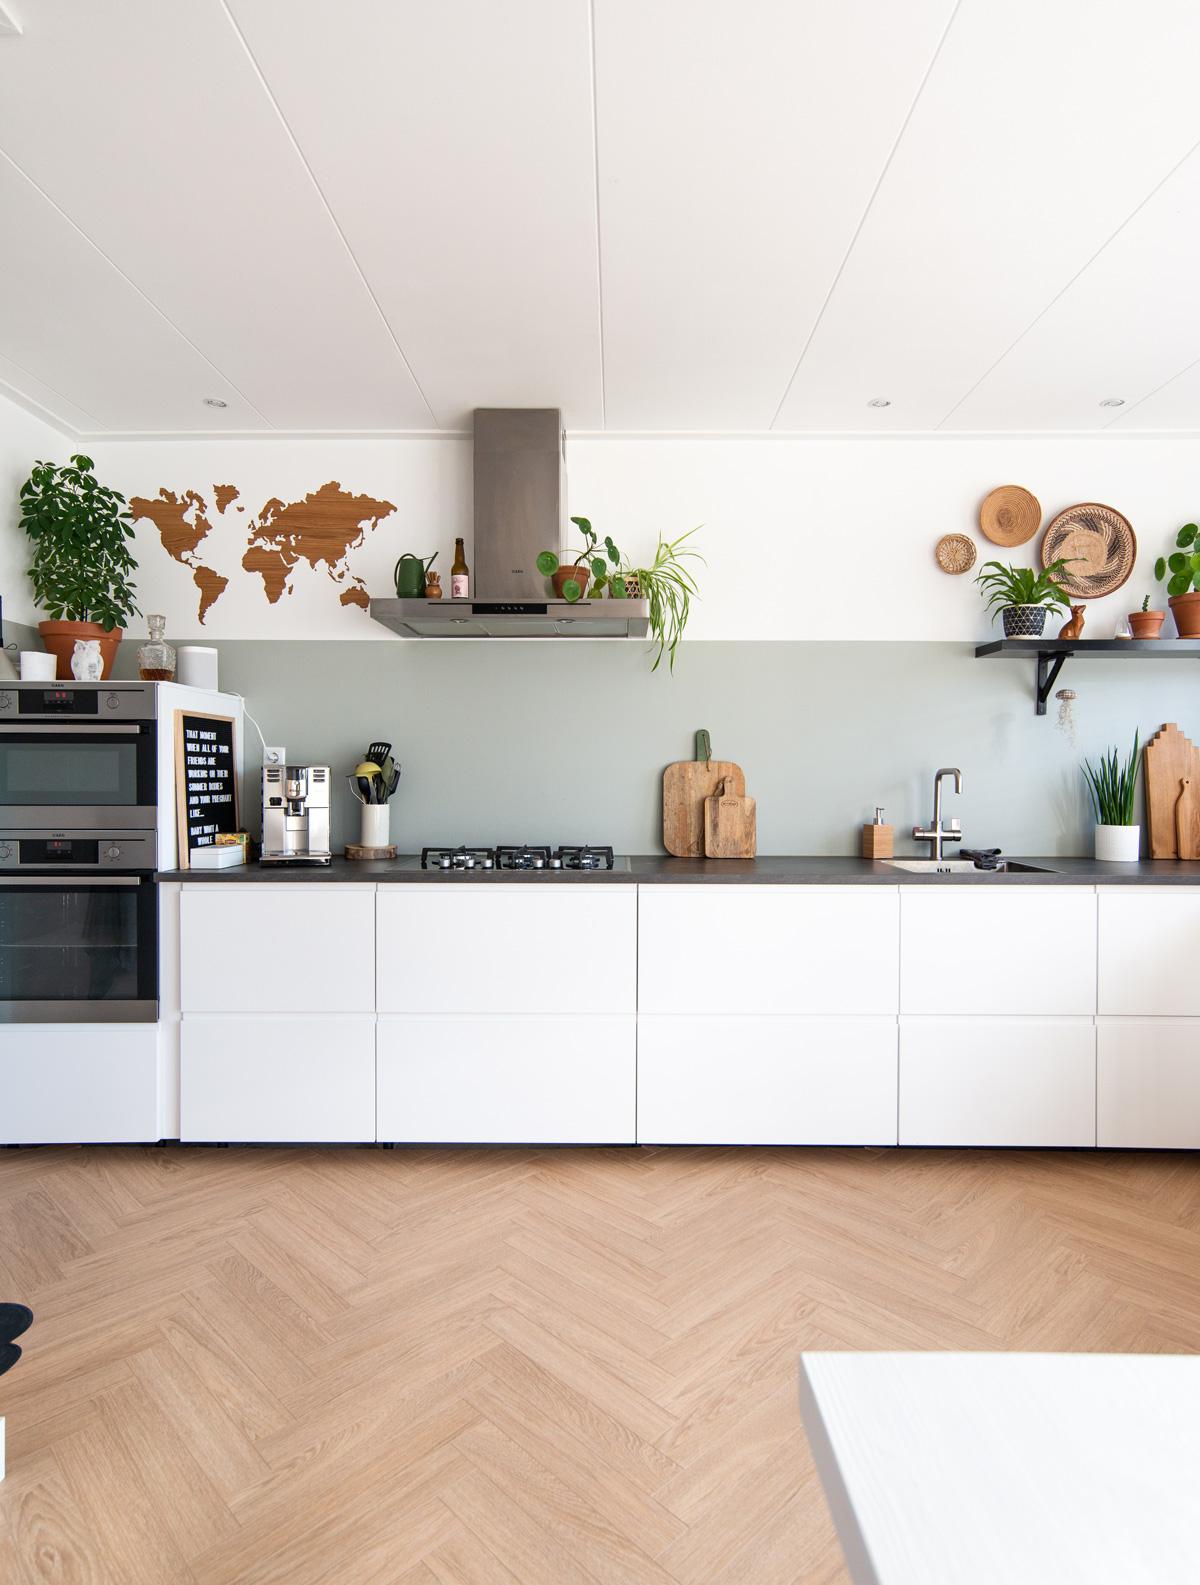 keeelly91 blogger visgraat Berry alloc vloer eiken hout Ikea kitchen wit greeploos wooninspiratie